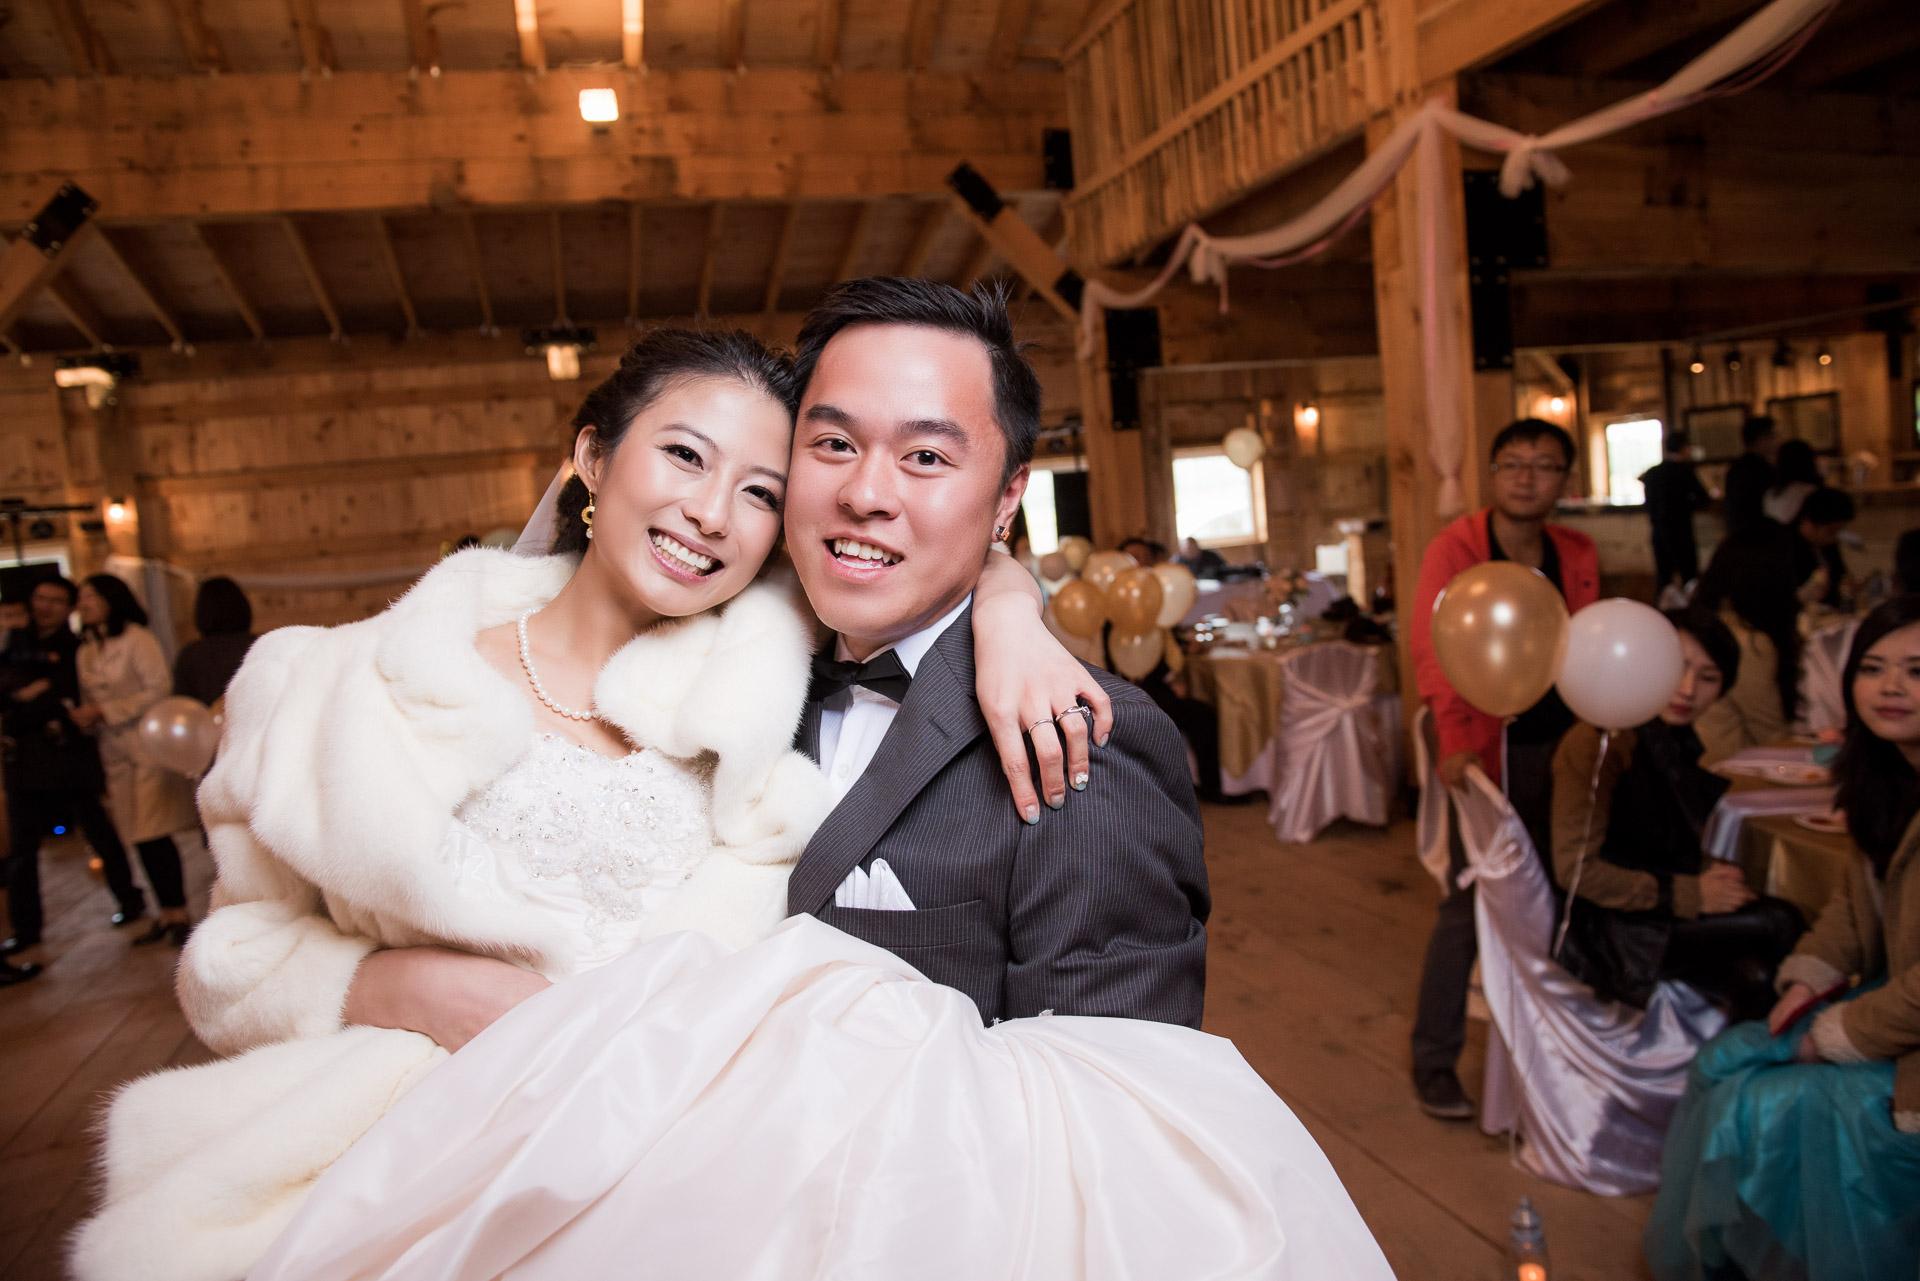 Sunday & Xin Wedding                  Sep, 2015